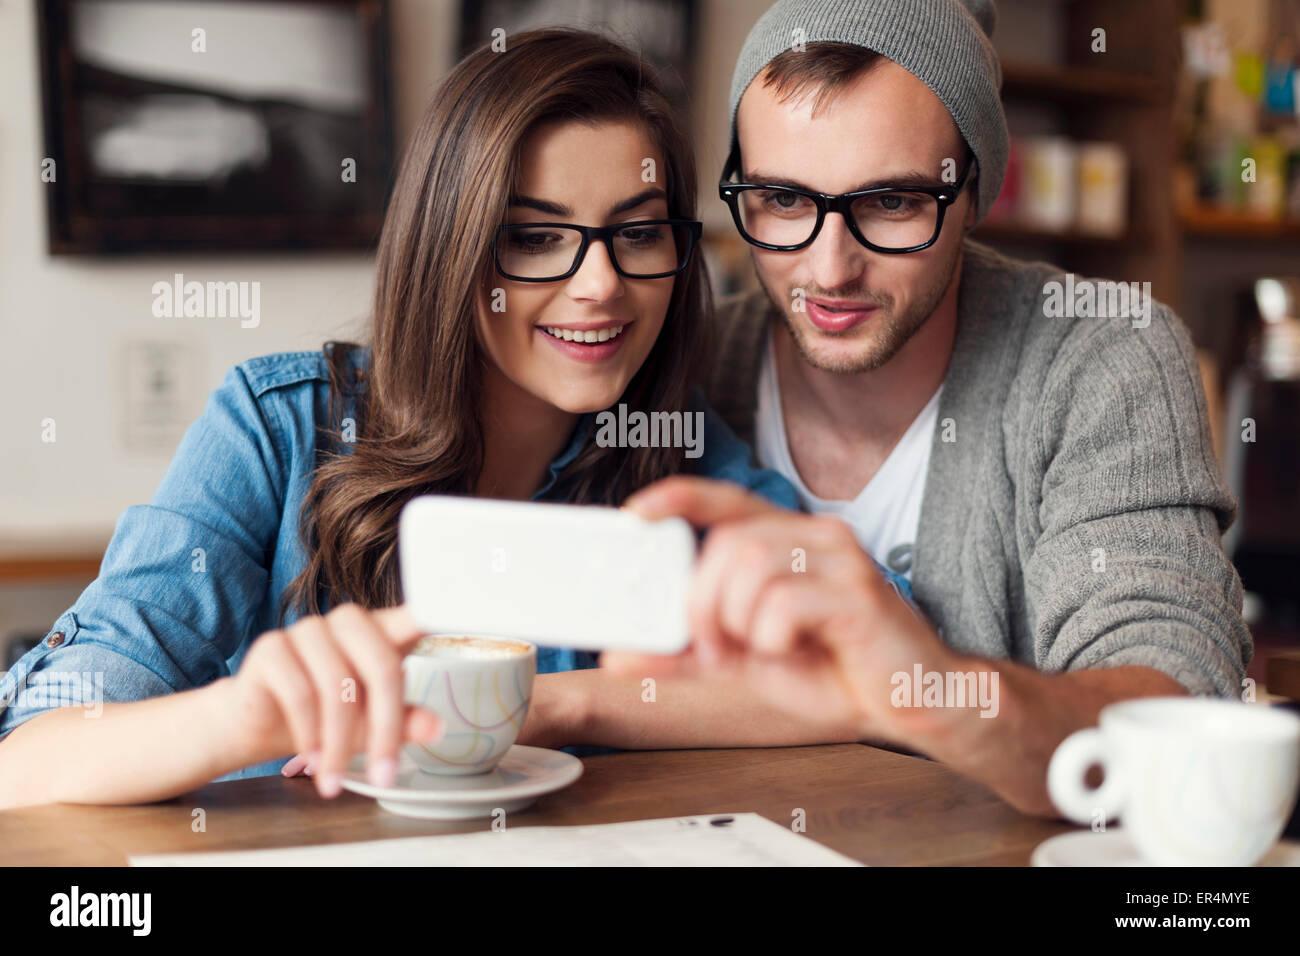 Hipster par a través de teléfono móvil en el cafe. Cracovia, Polonia Imagen De Stock